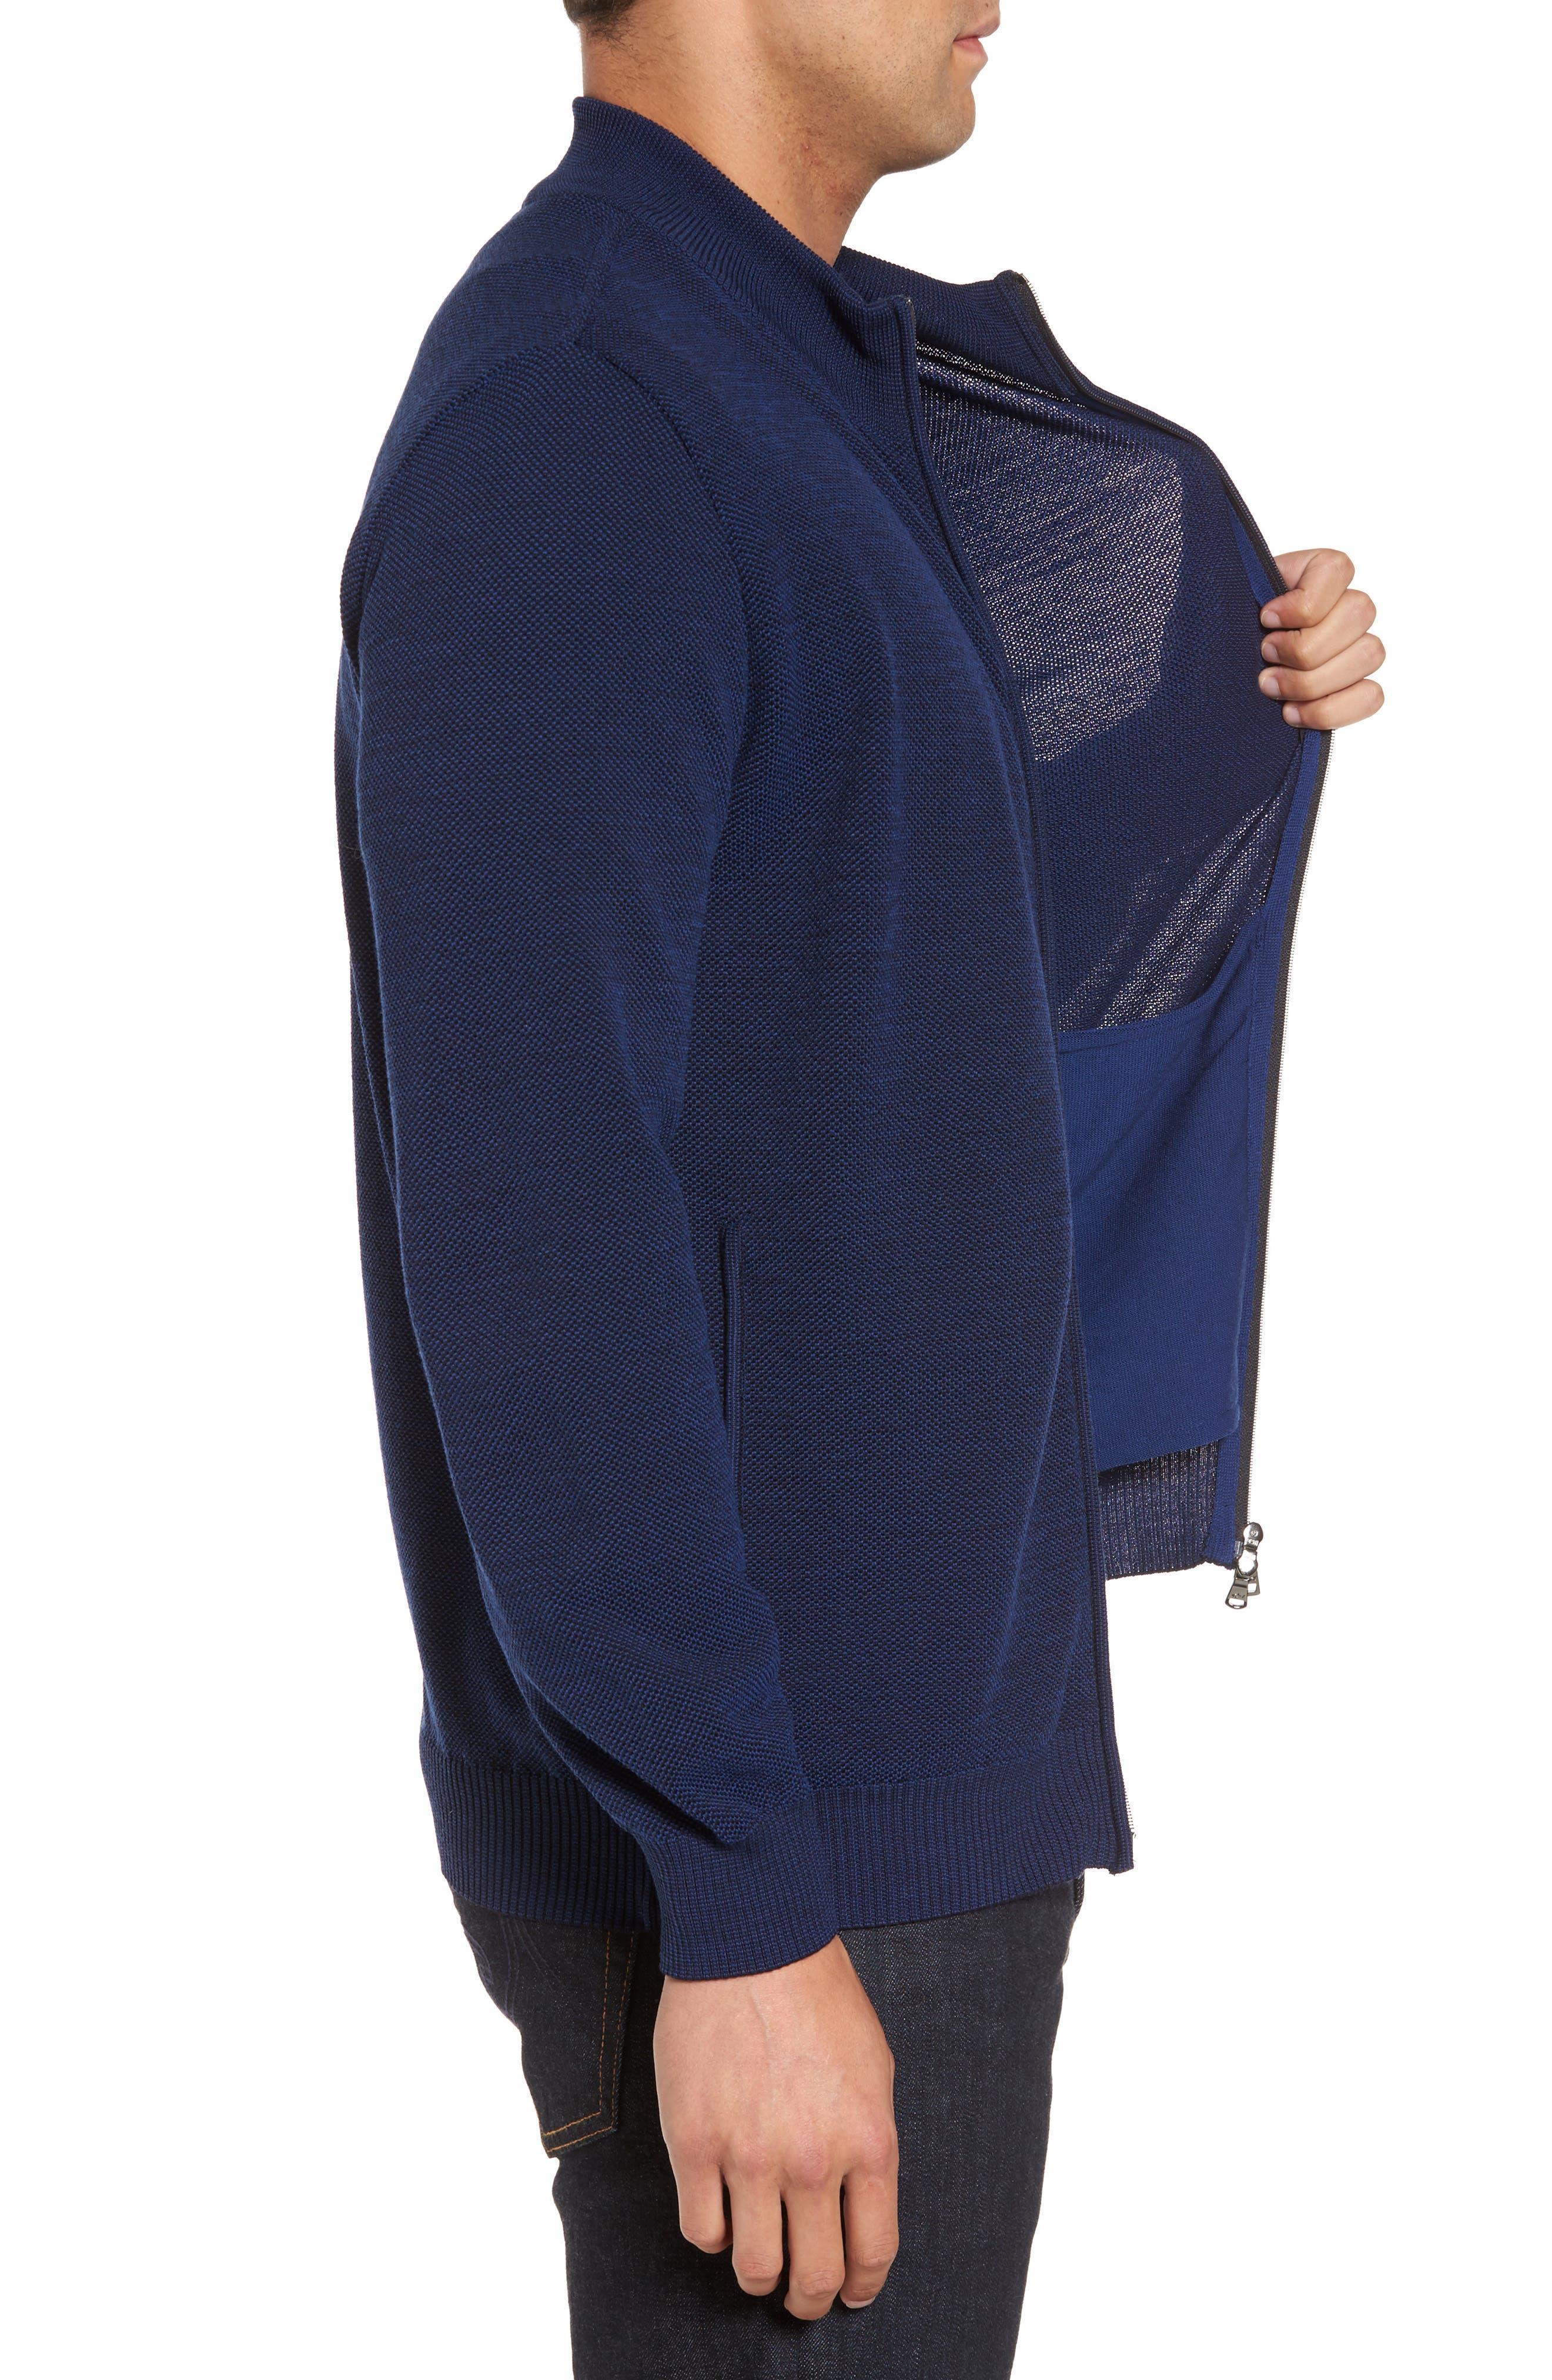 Paul&Shark Piqué Zip Wool Sweater,                             Alternate thumbnail 3, color,                             400